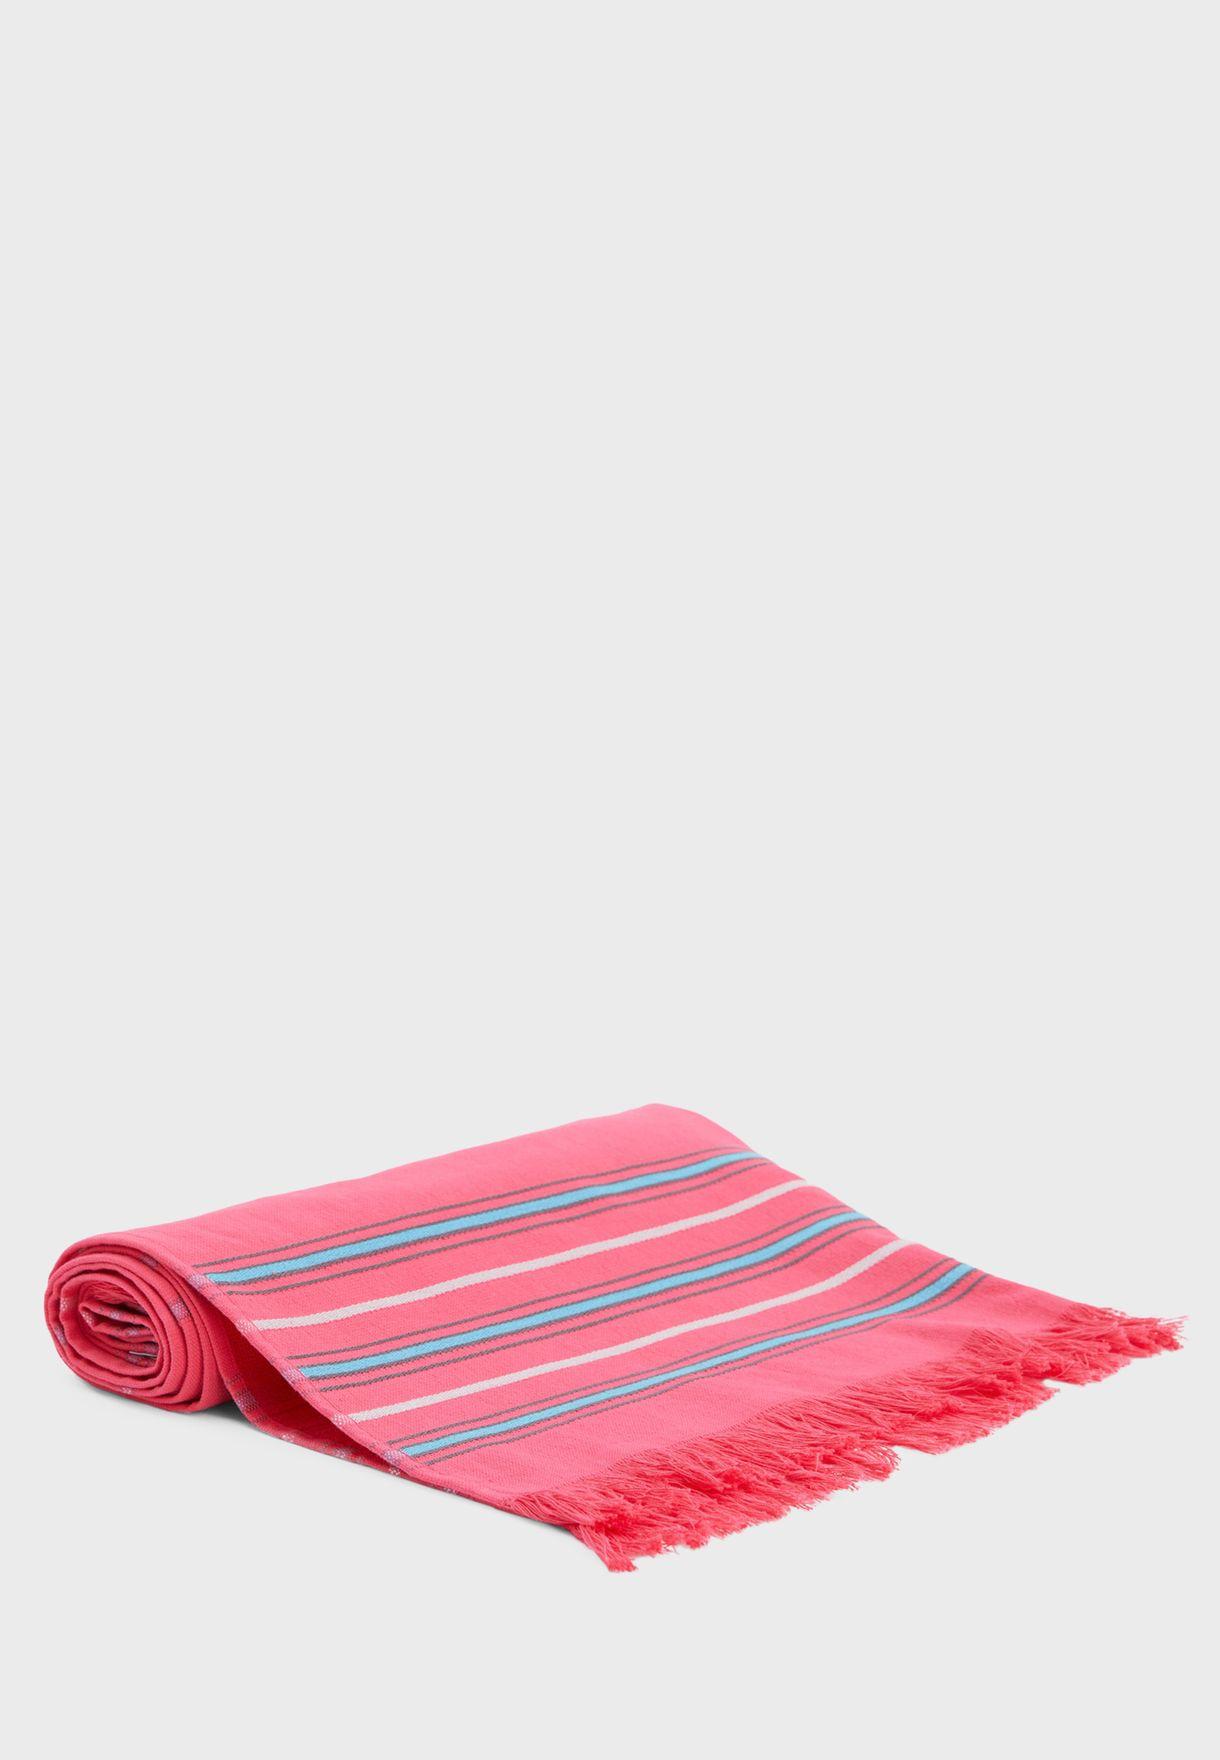 Printed Beach Towel